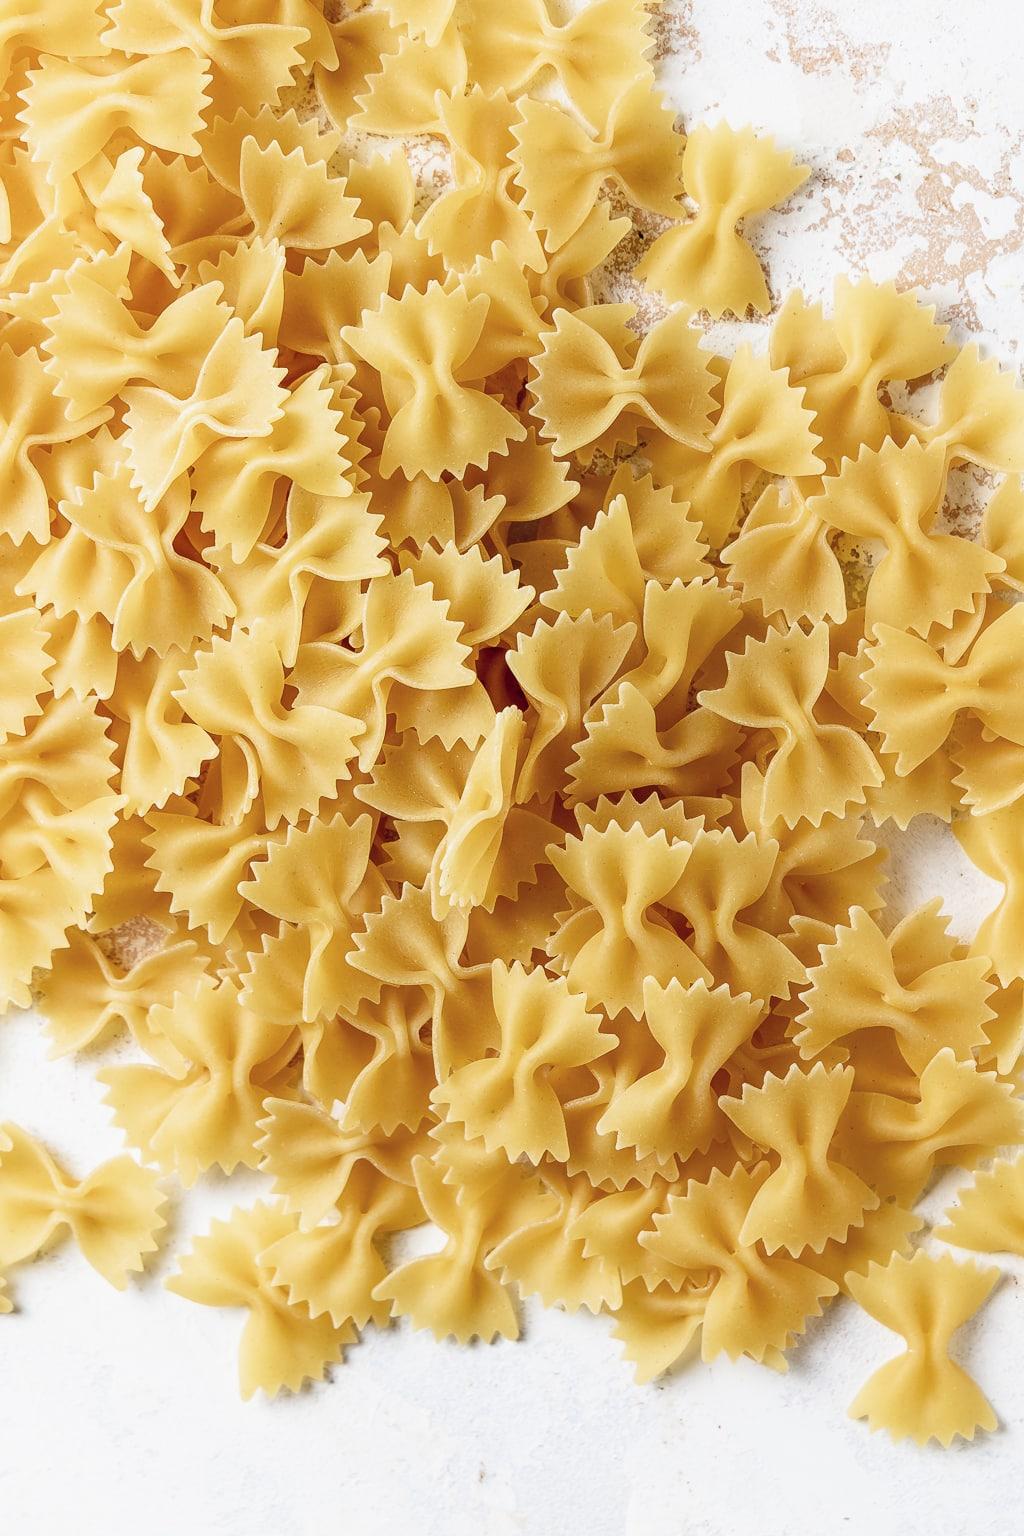 dried farfalle pasta